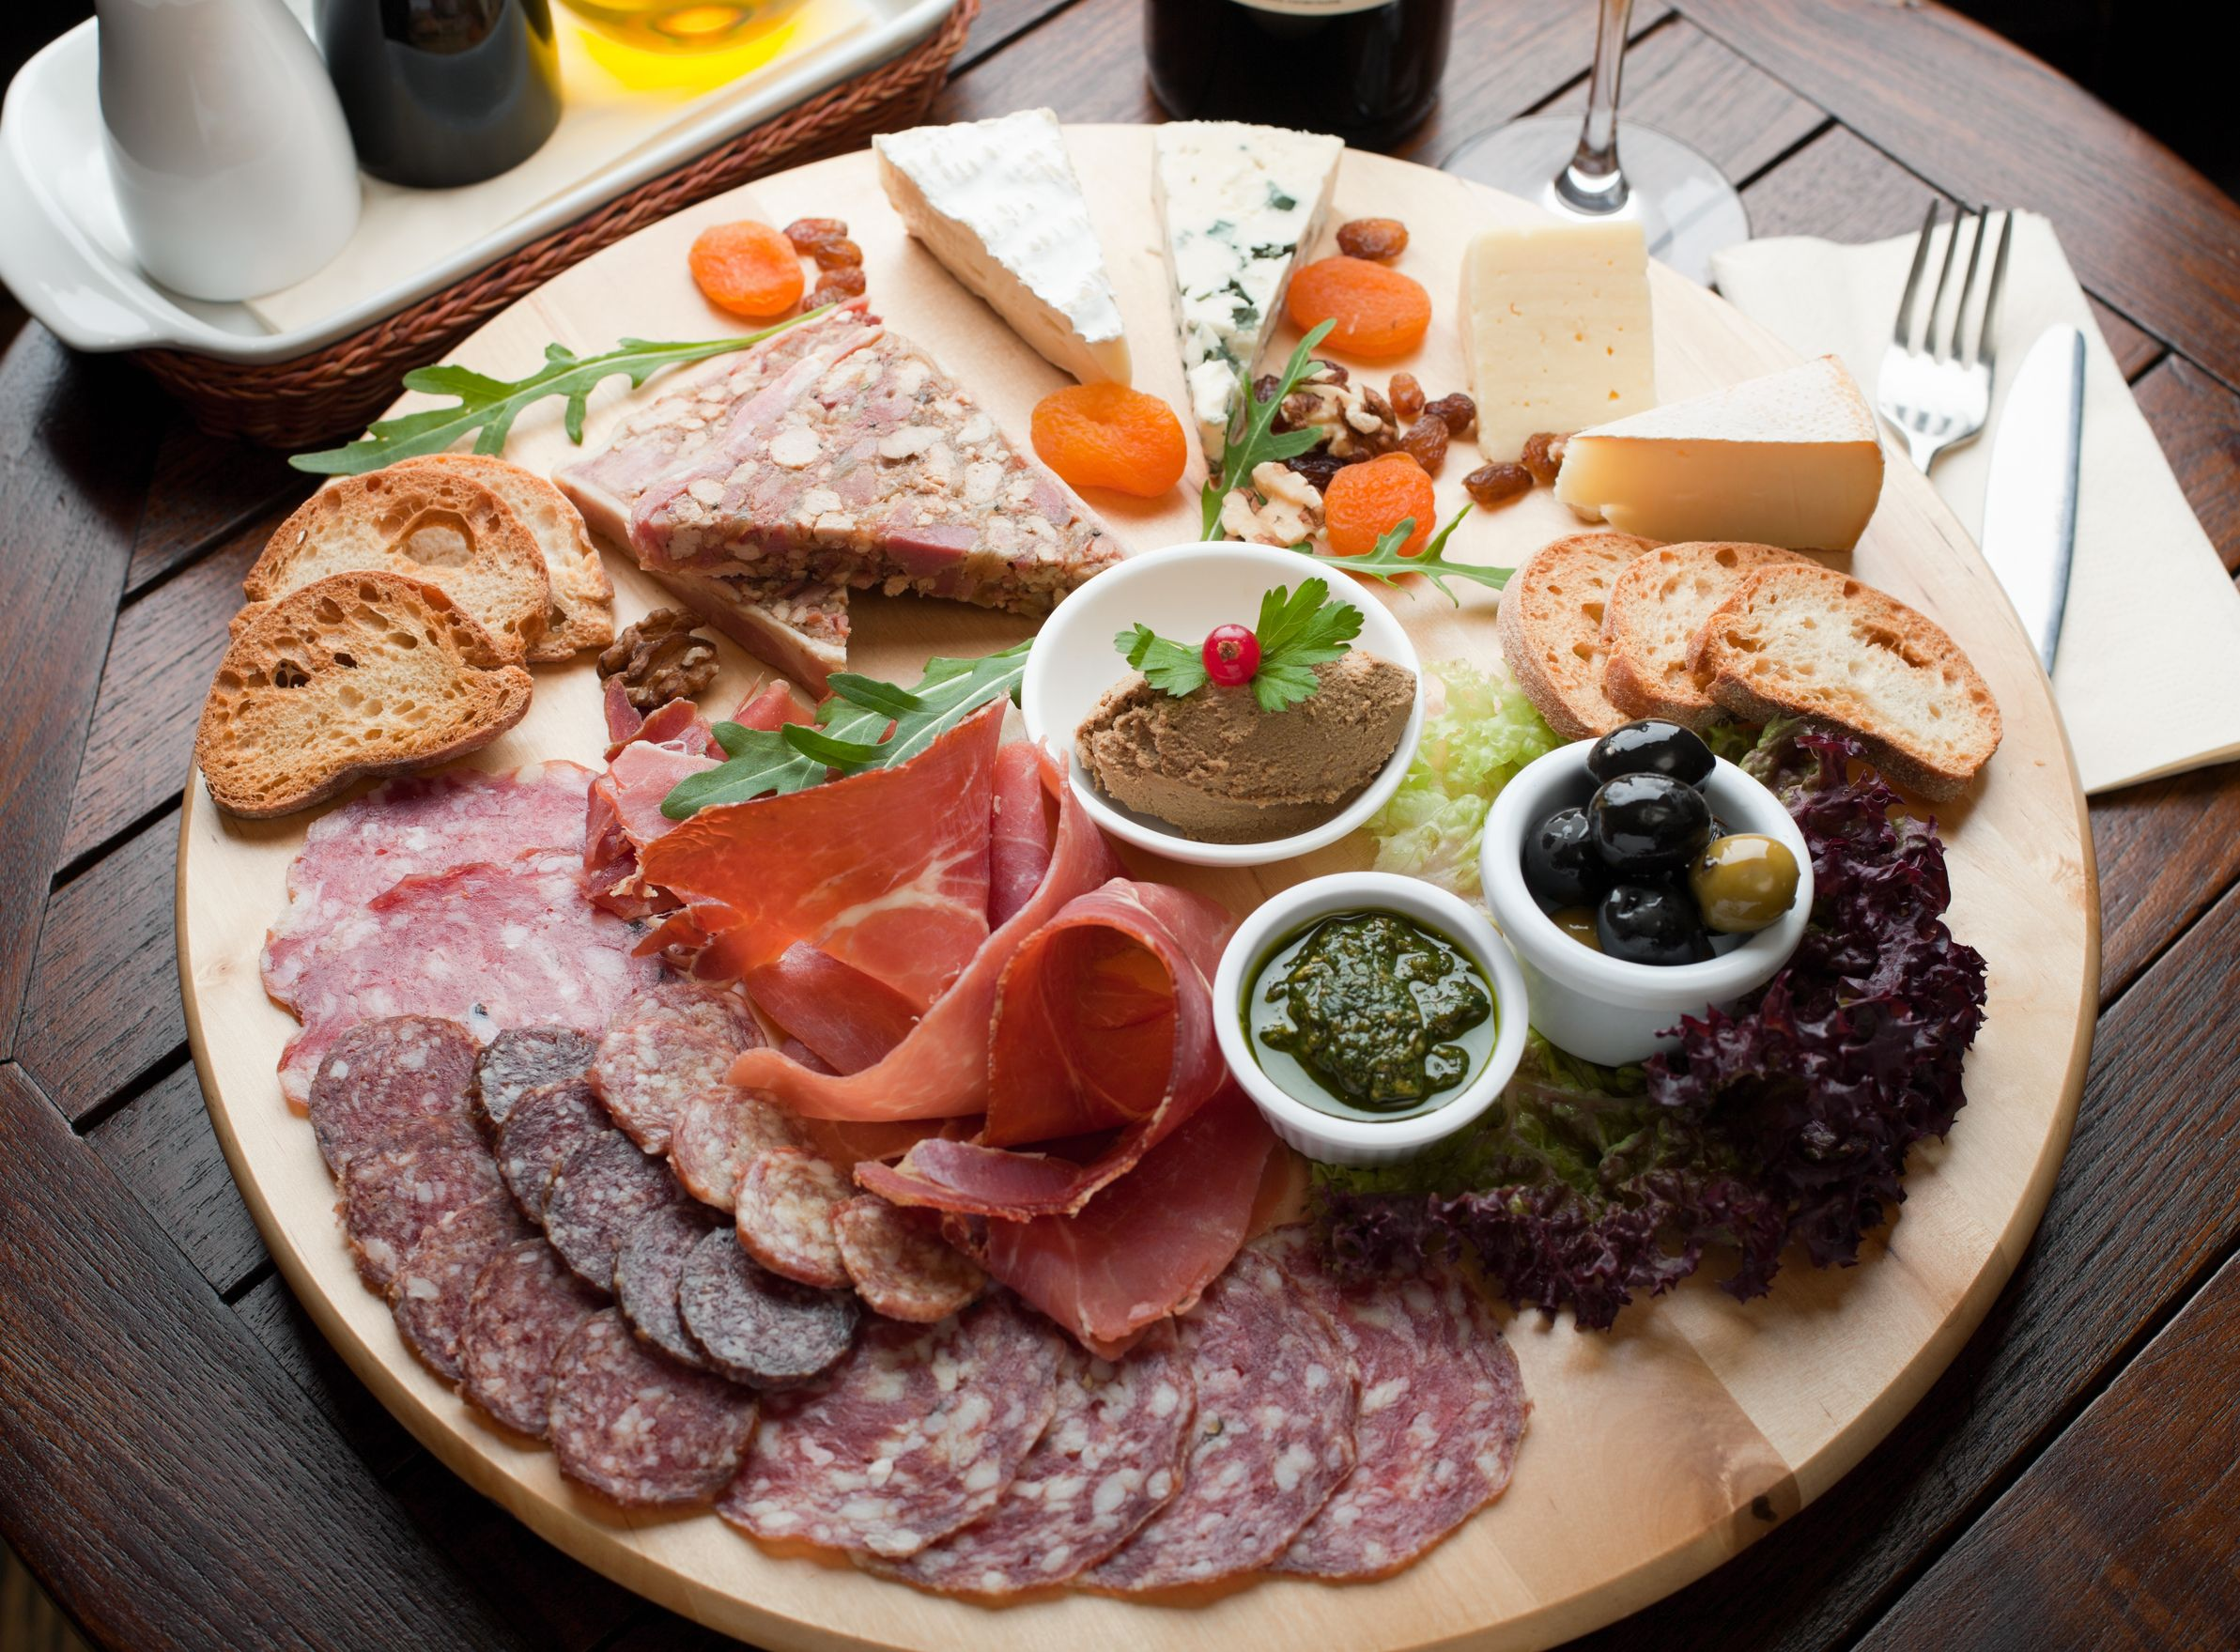 13368917 - mozzarella, beef tomato, rocket salad, basil, drizzled with avocado oil, parma ham